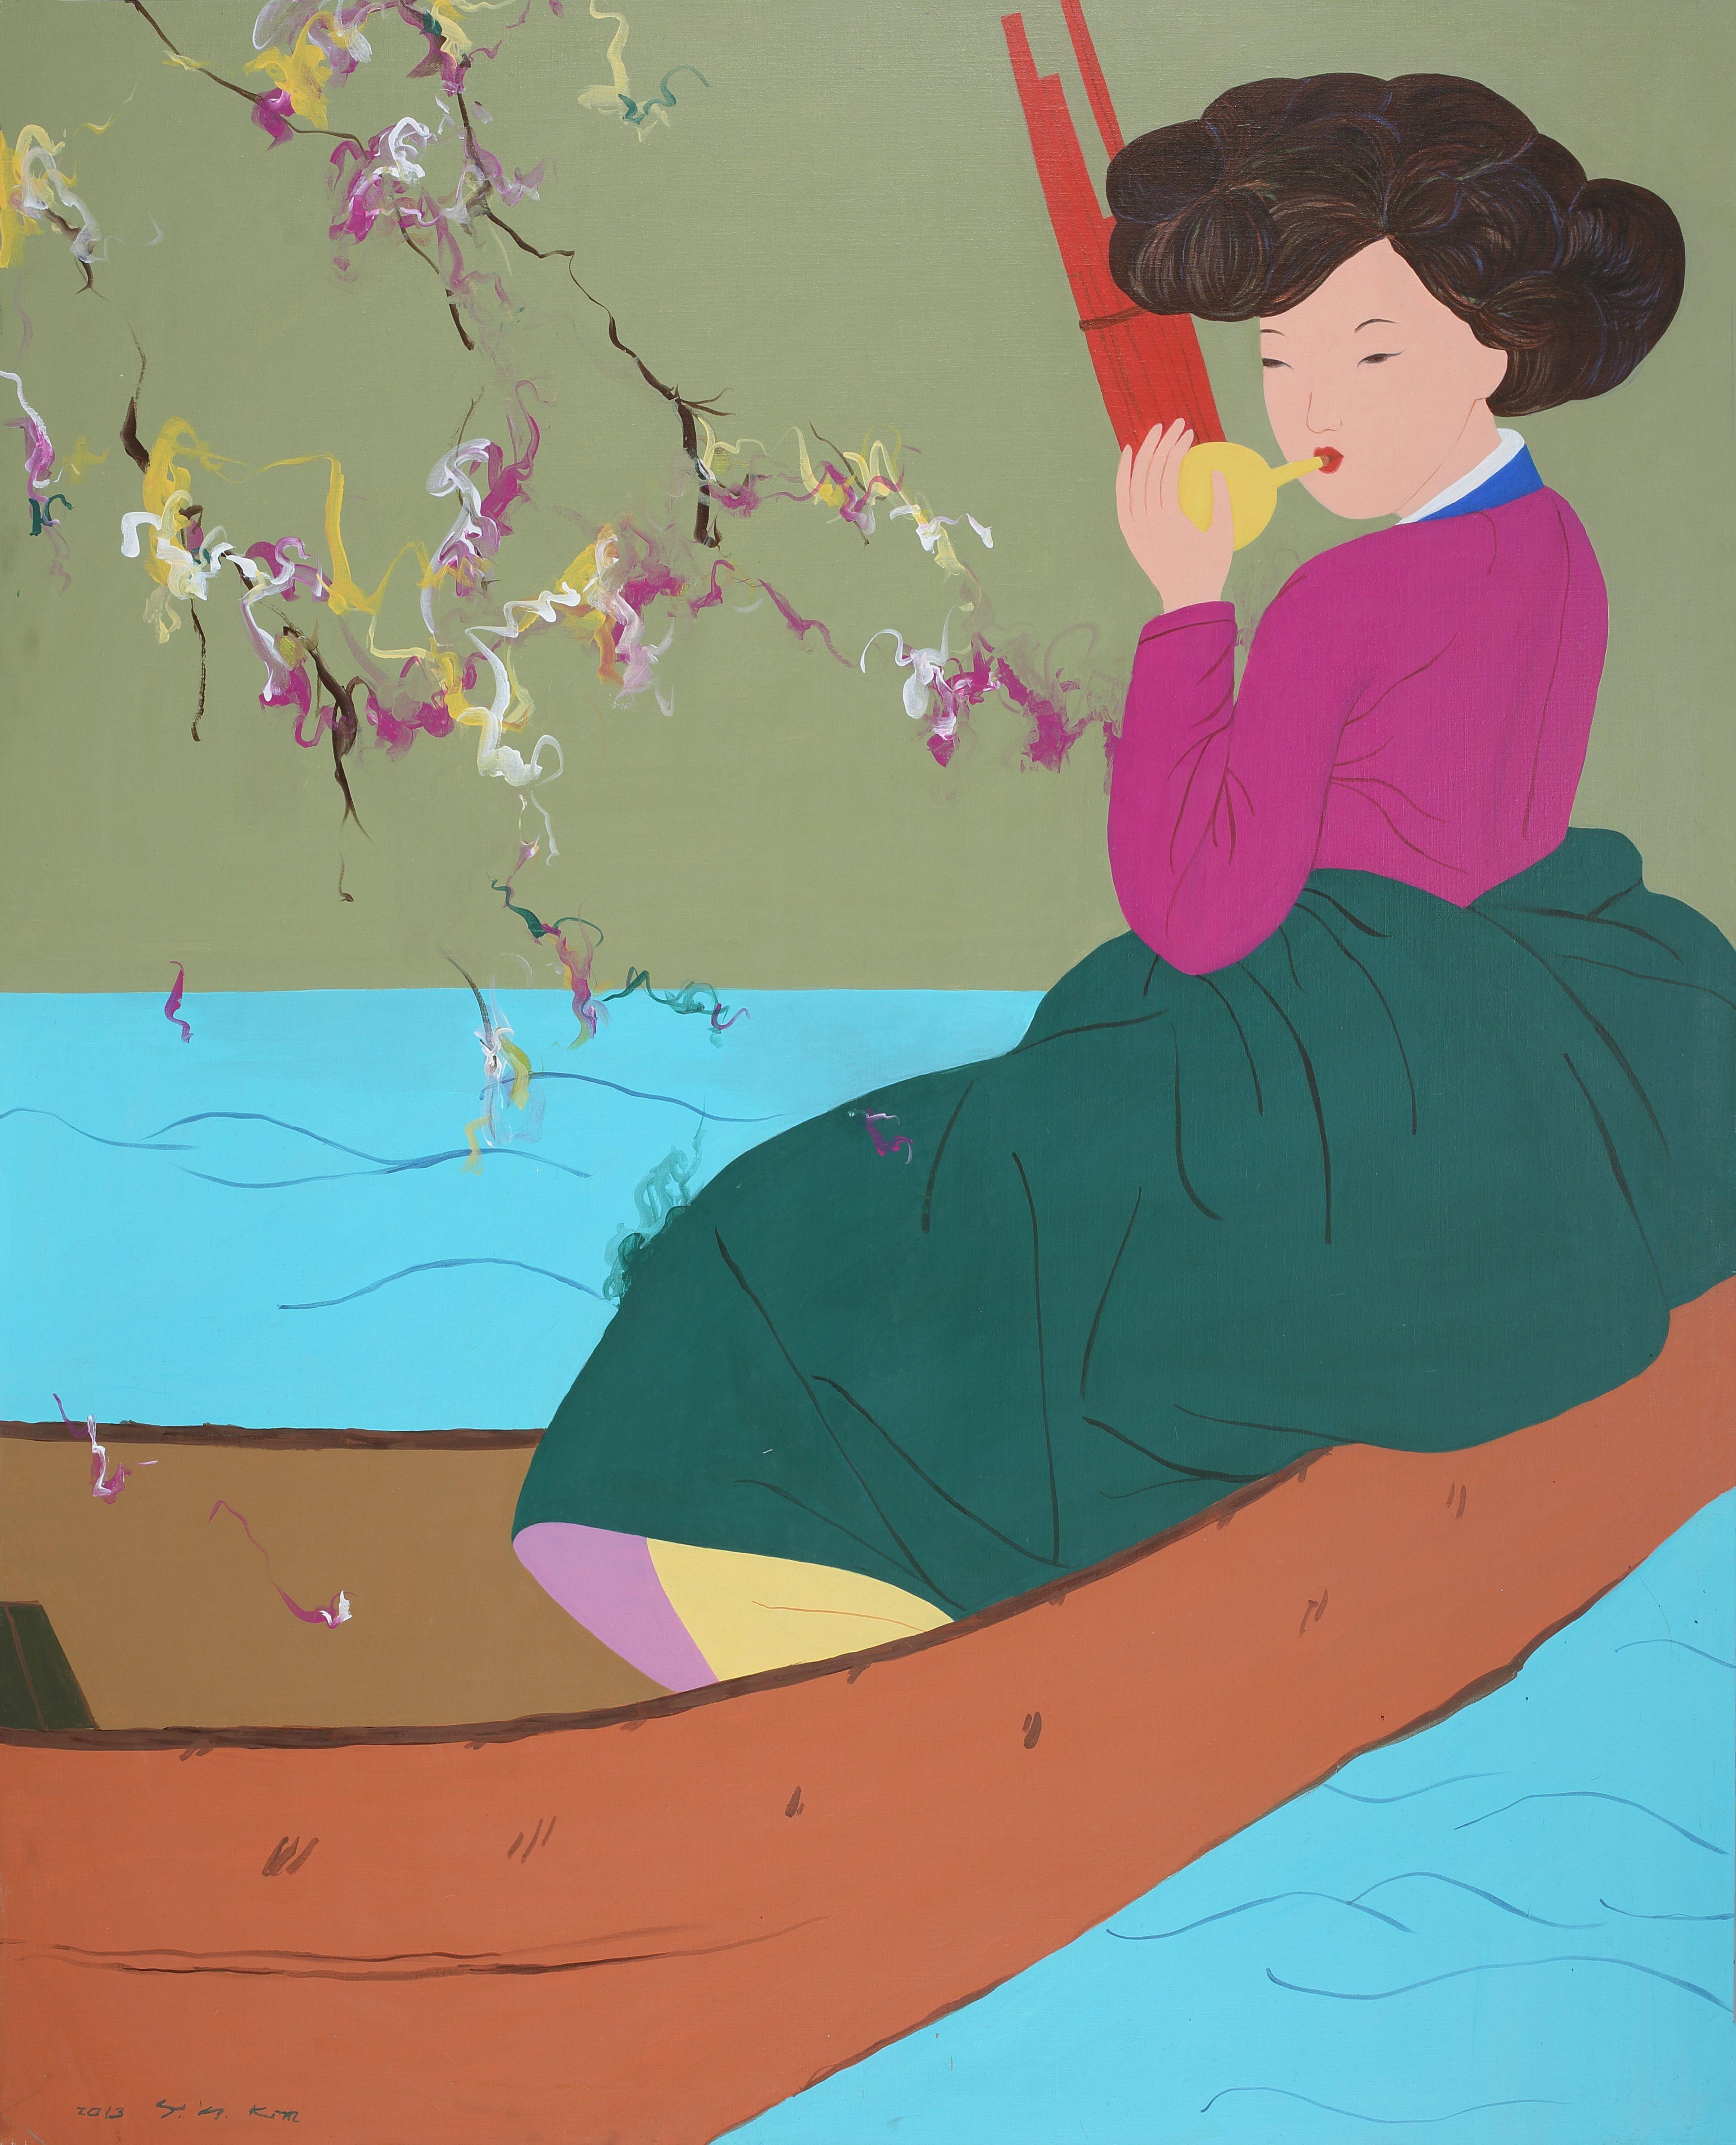 Spring breeze, 162x130cm, Acrylic on Canvas, 2013 by 김양희 / 아트뮤제갤러리